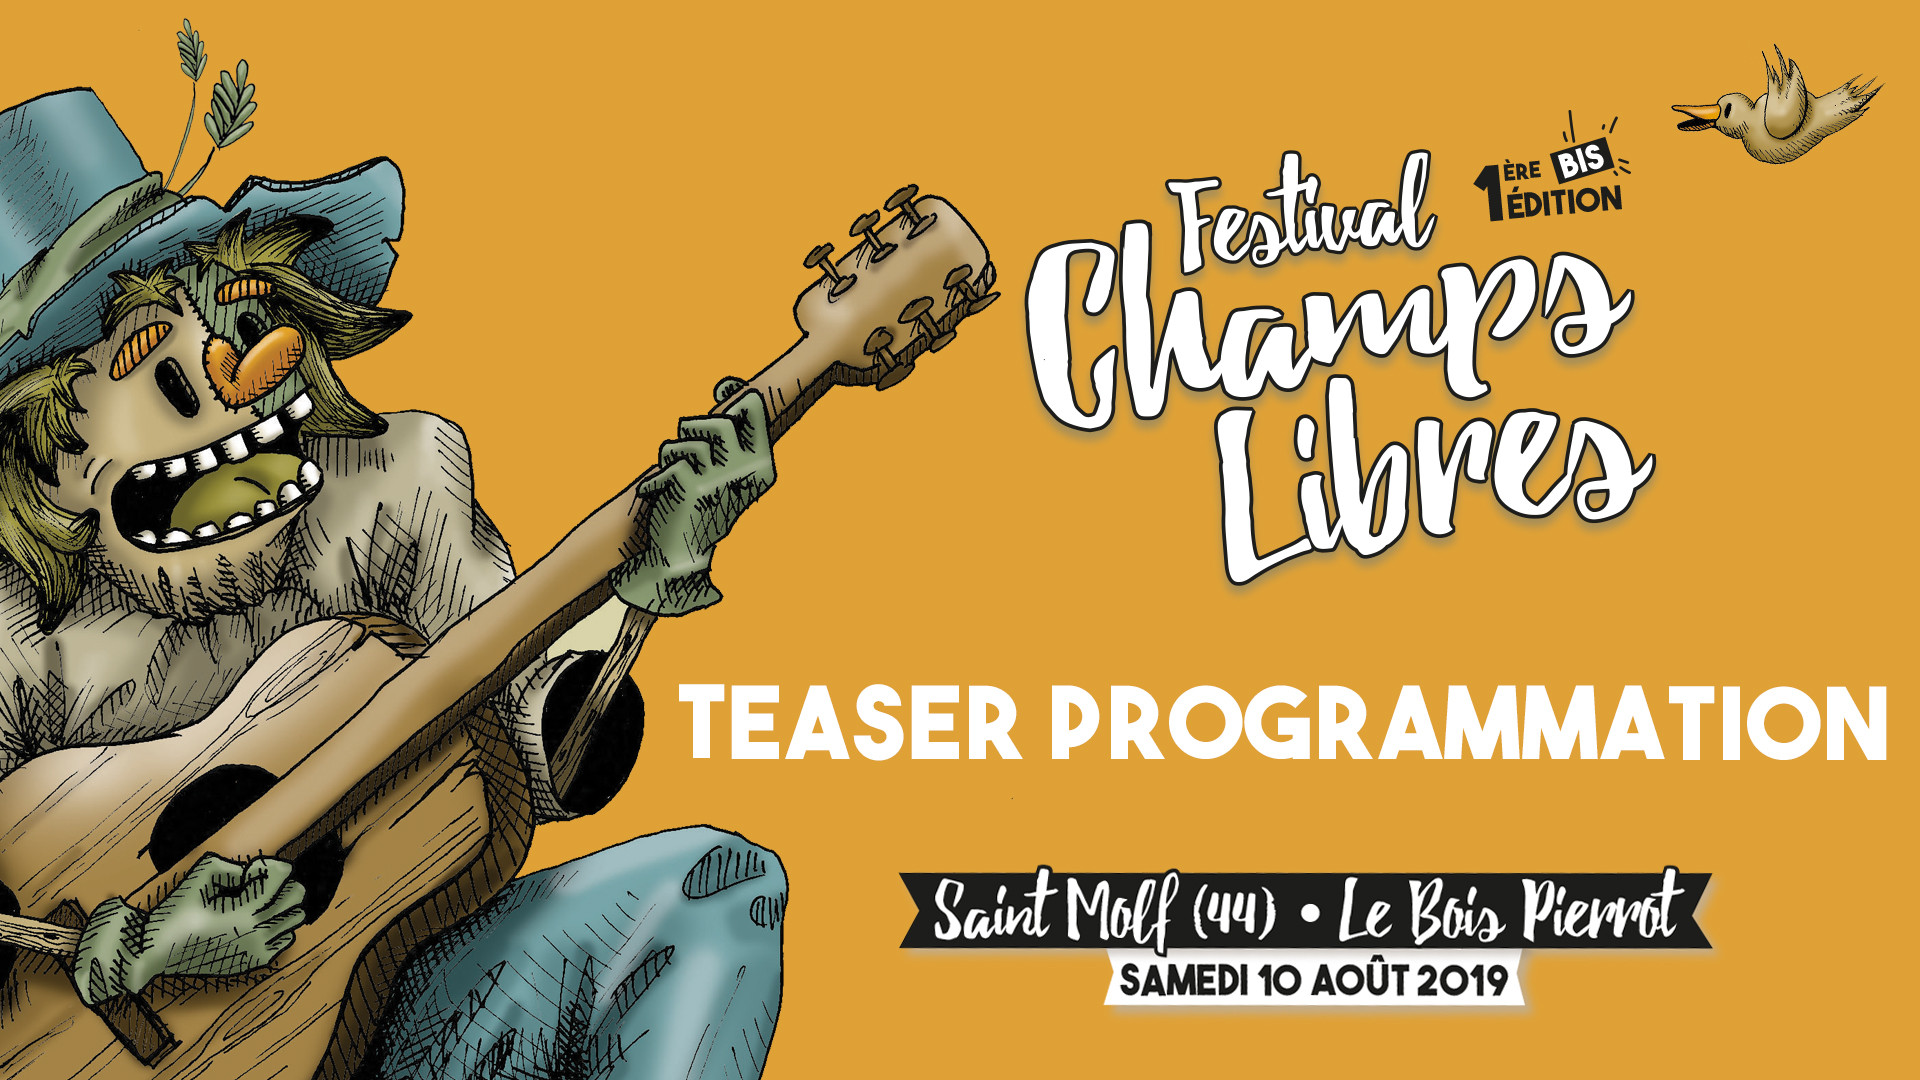 Teaser programmation - Festival Champs Libres